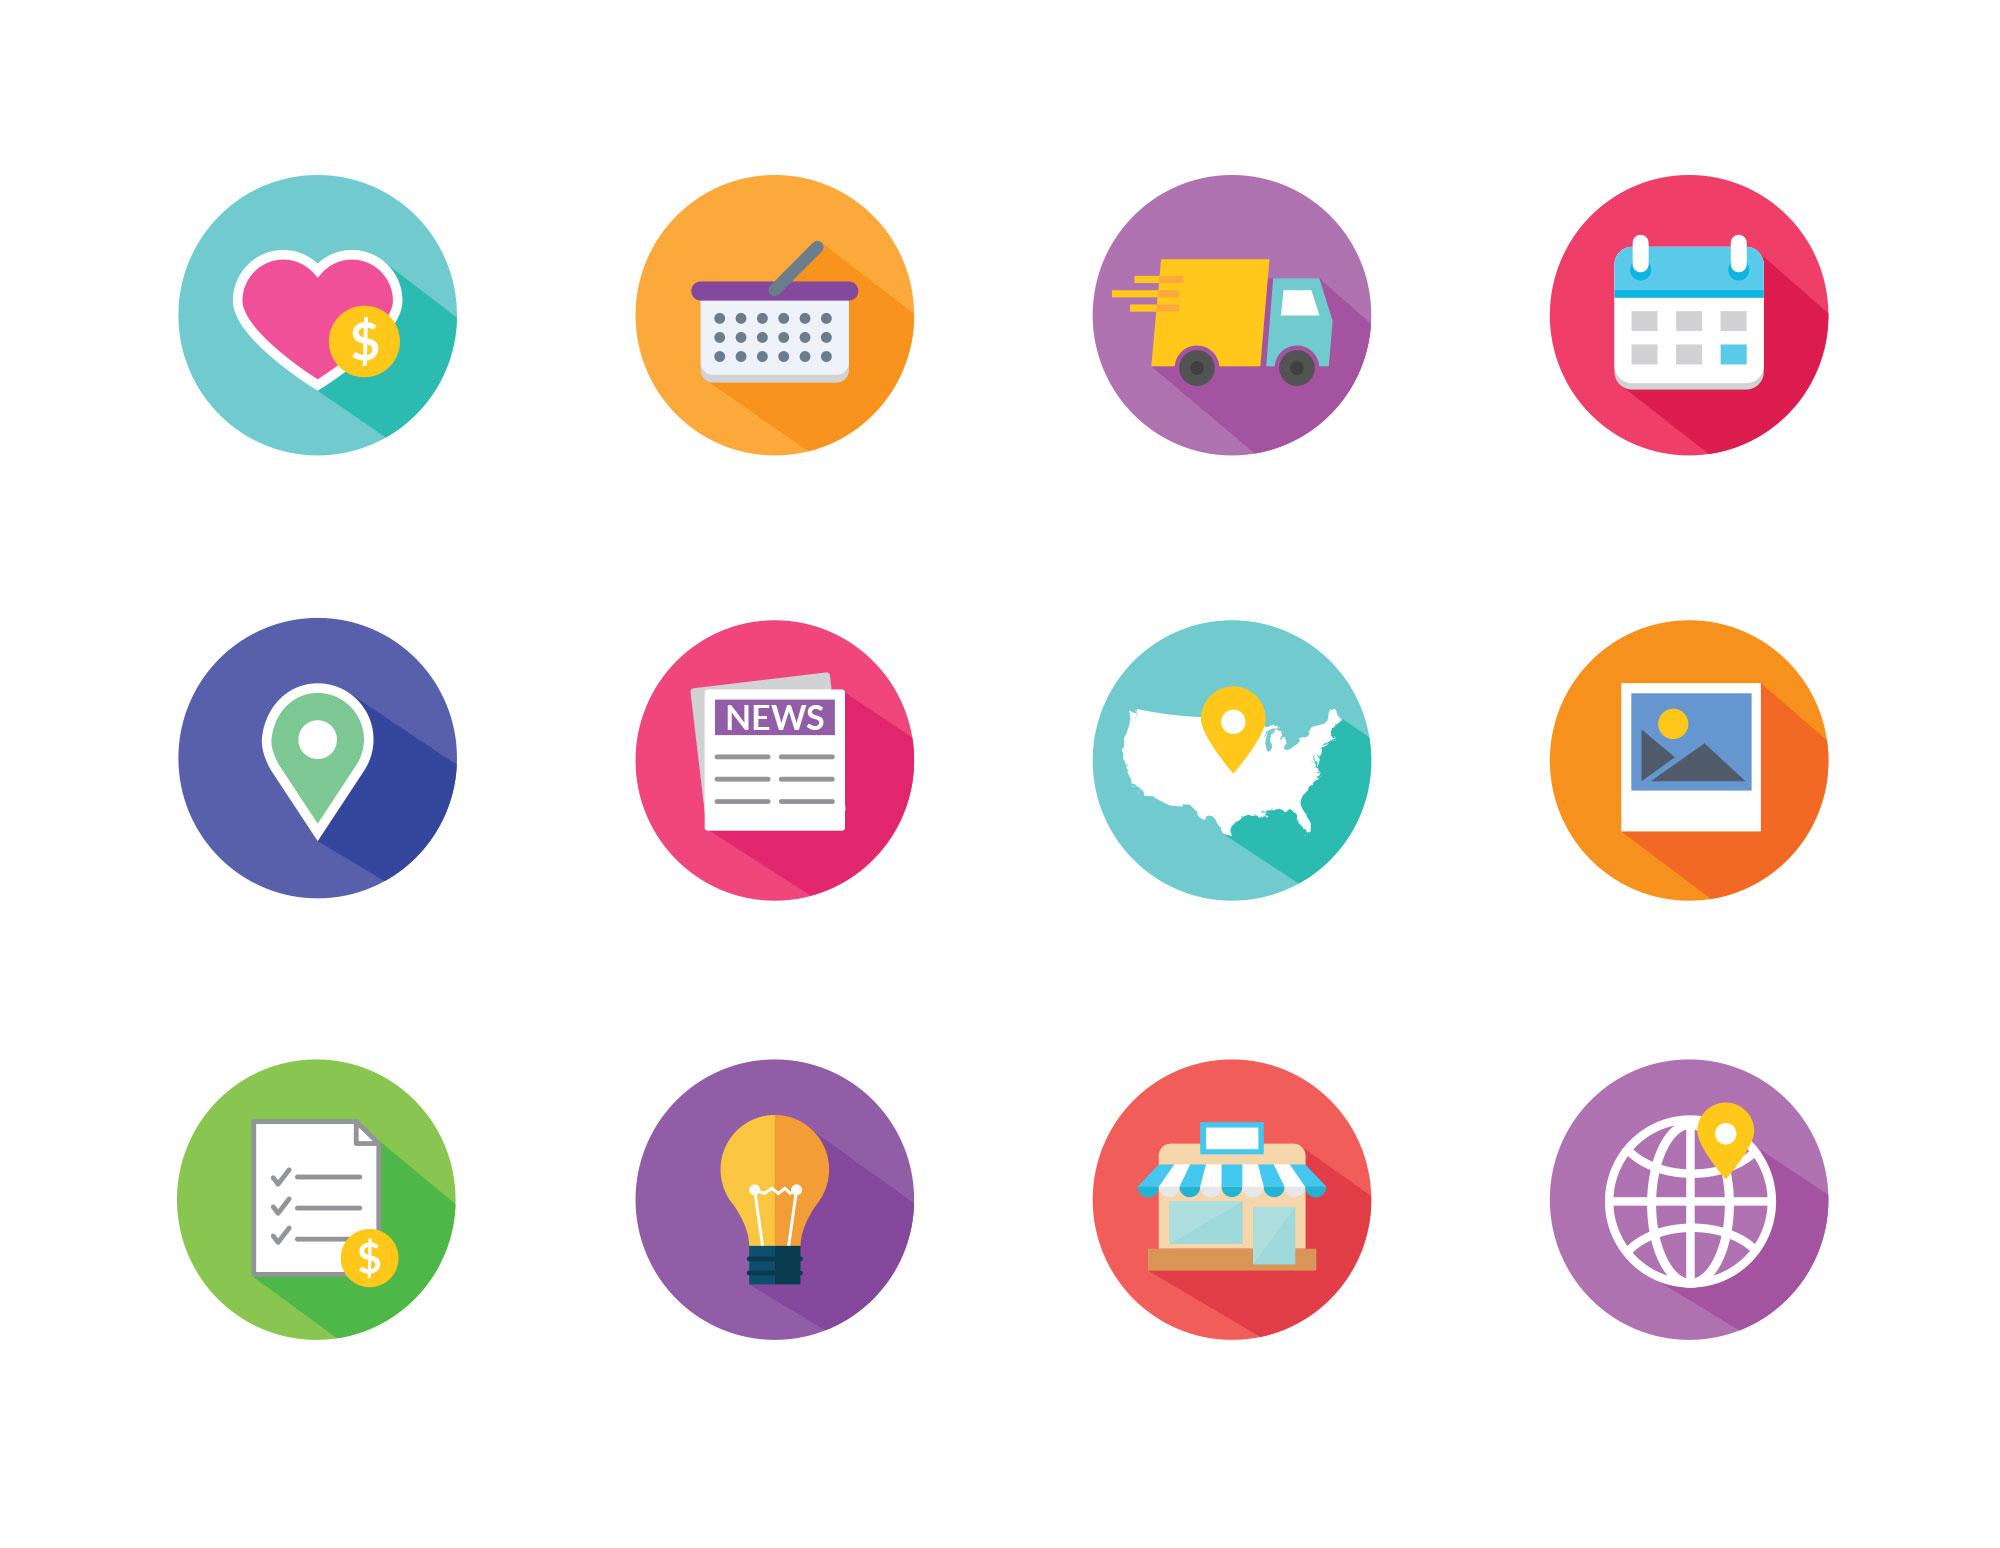 Scentco Icons Image